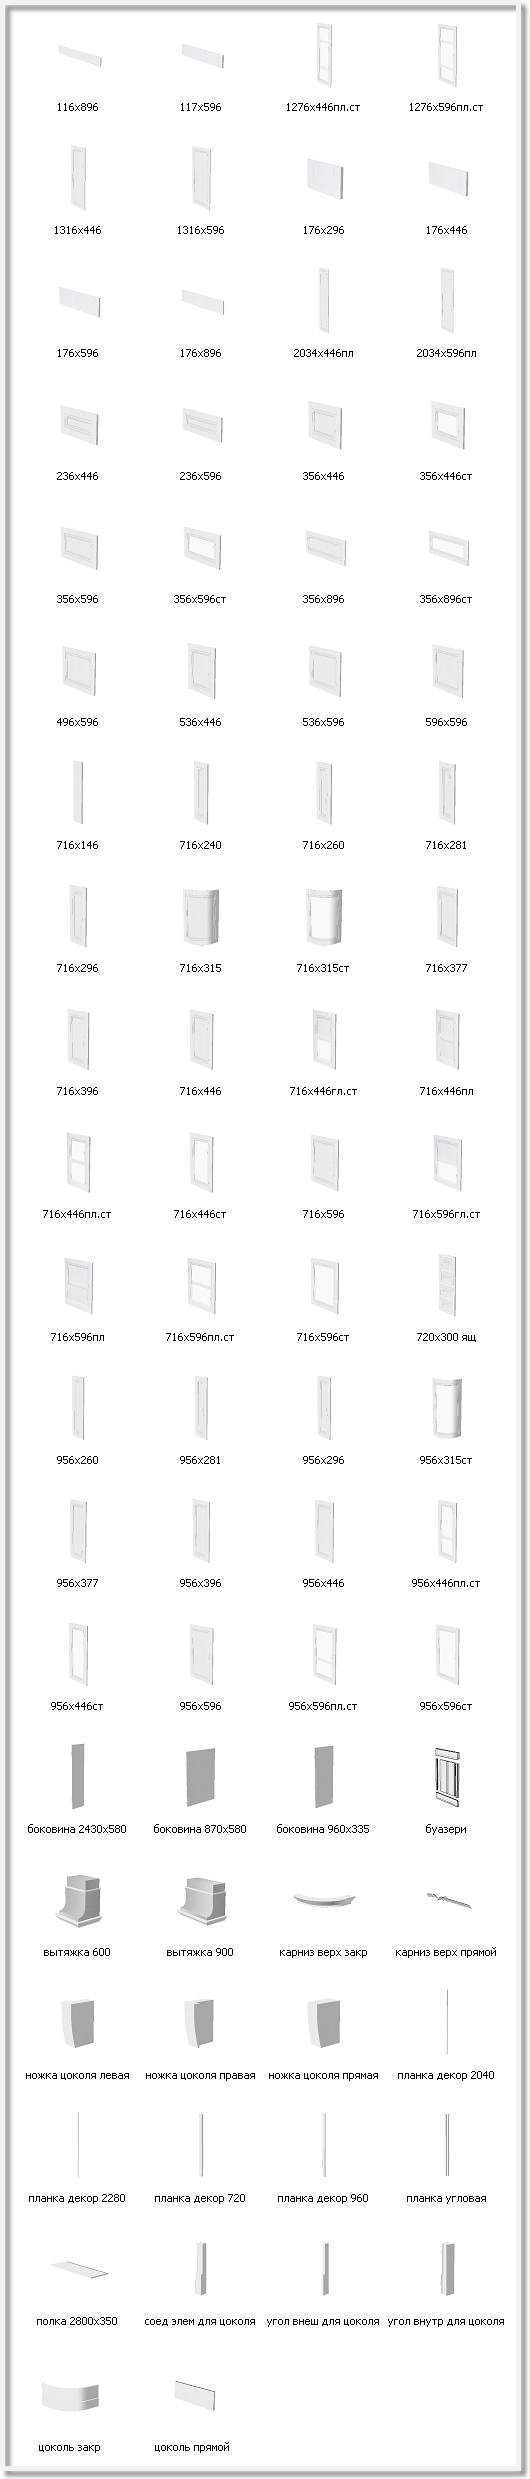 библиотеки для pro100